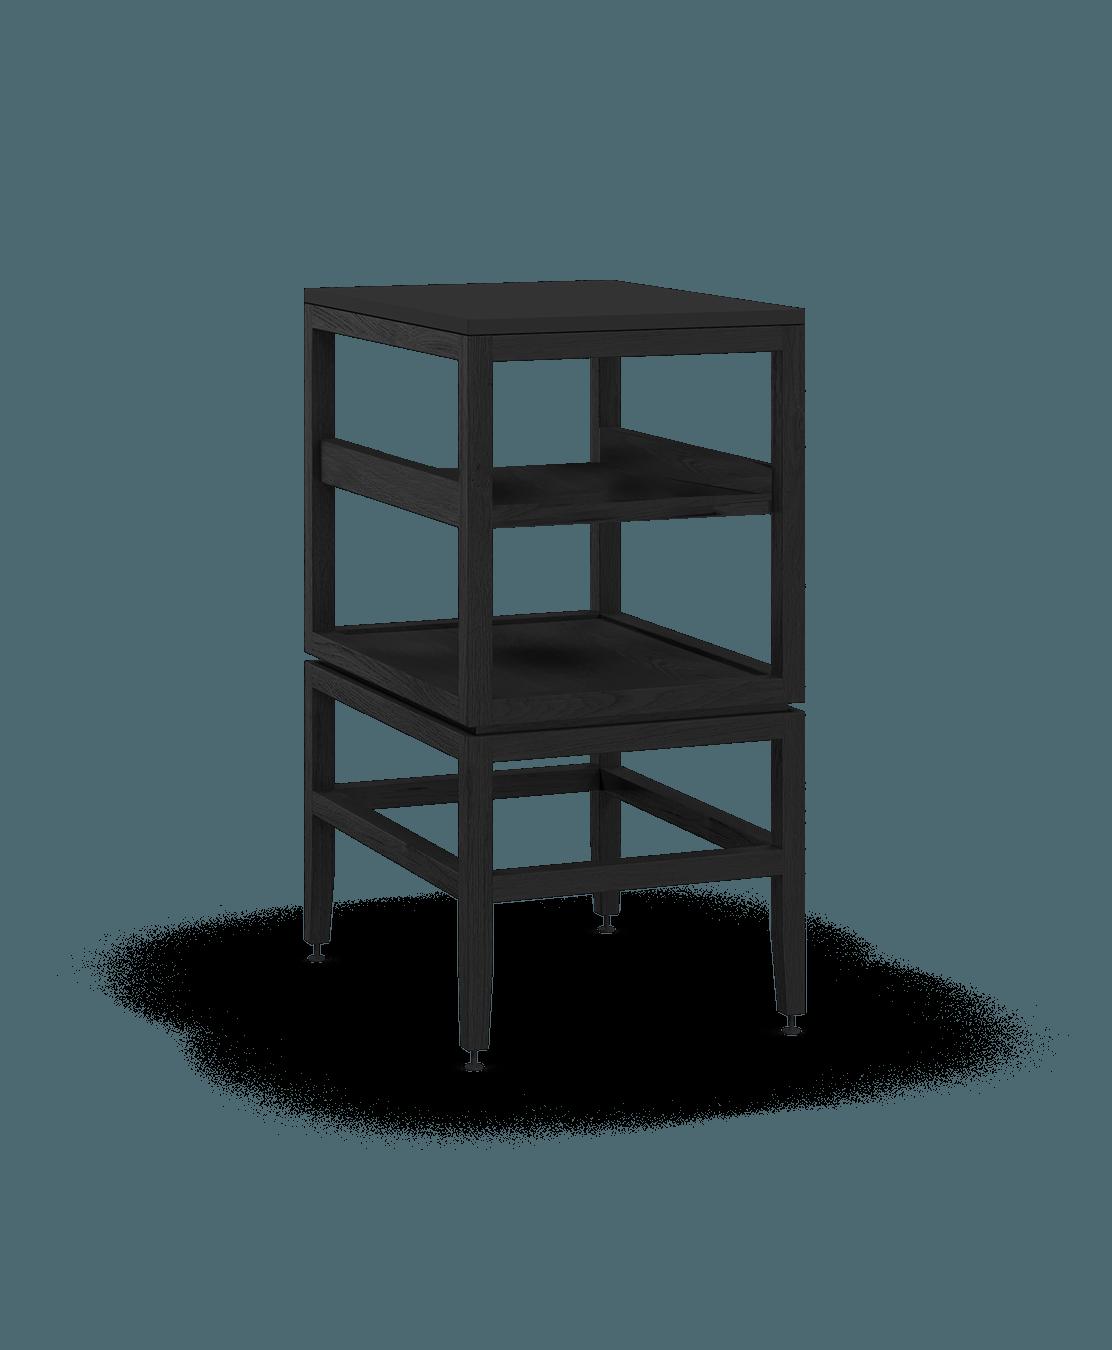 coquo volitare midnight black stained oak solid wood modular cube 1 shelf storage open cabinet 18 inch C2-N-1824-001W1-BK